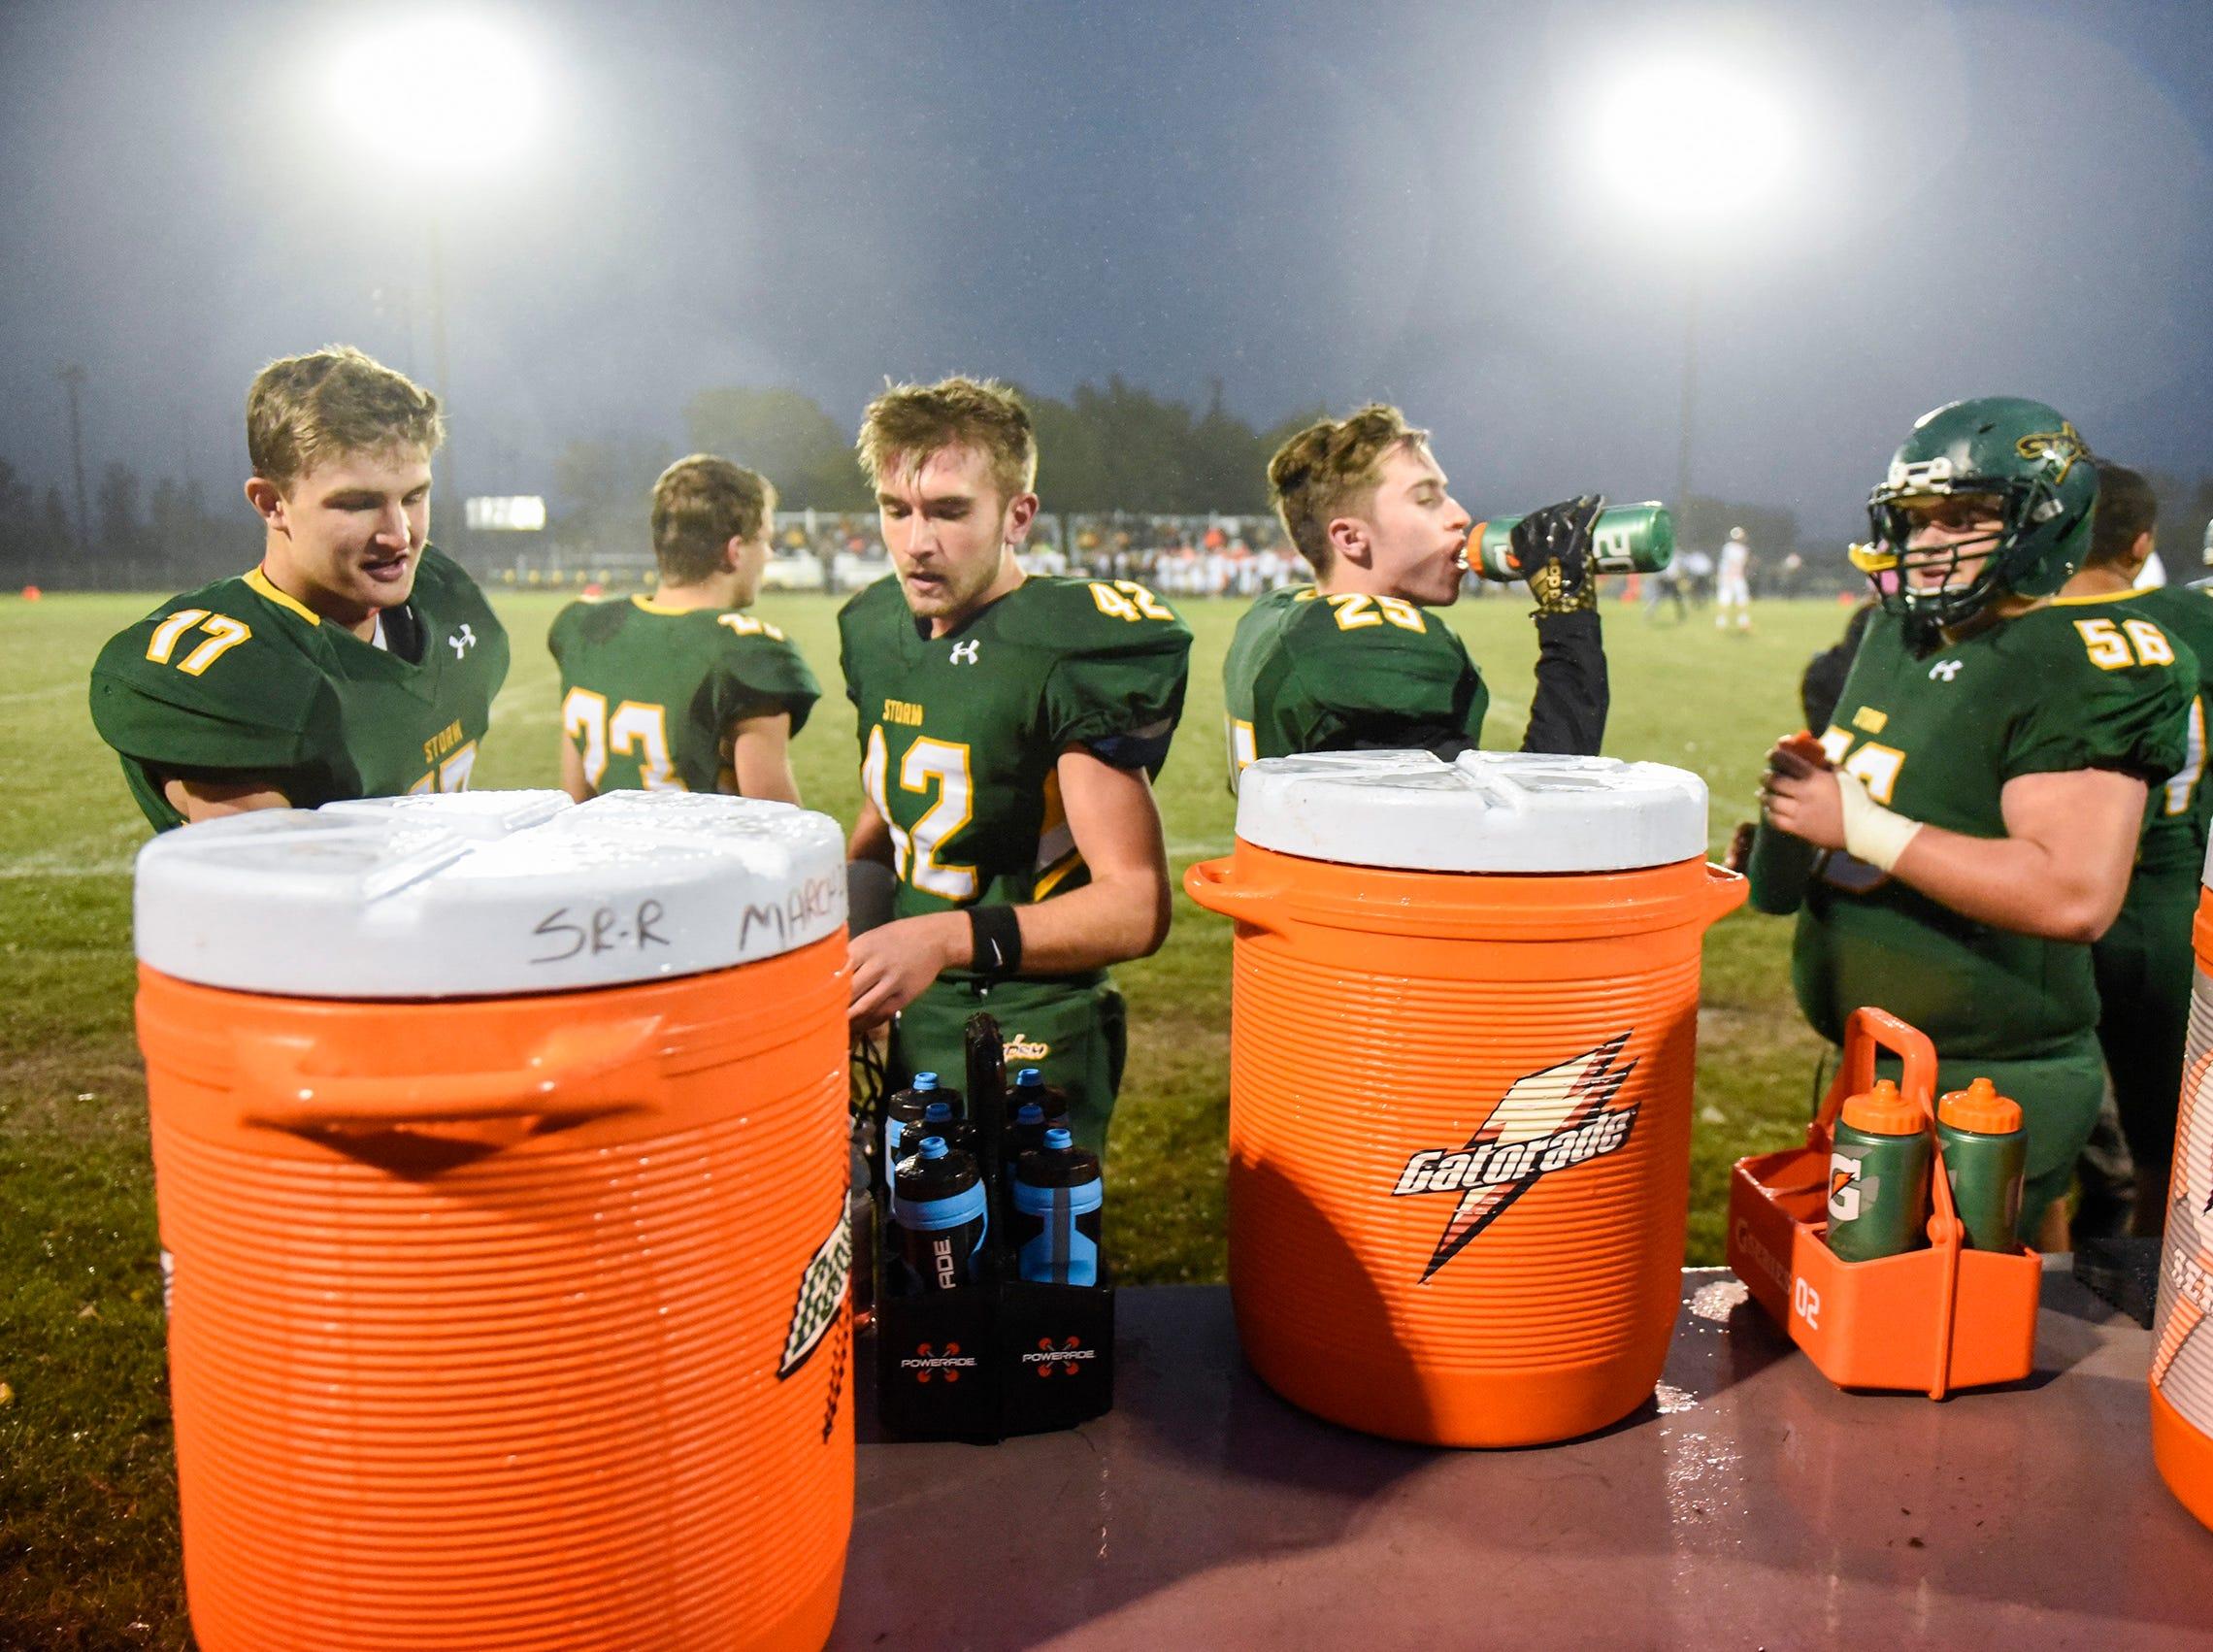 Sauk Rapids players take a drink during the first half Friday, Oct. 5, in Sauk Rapids.